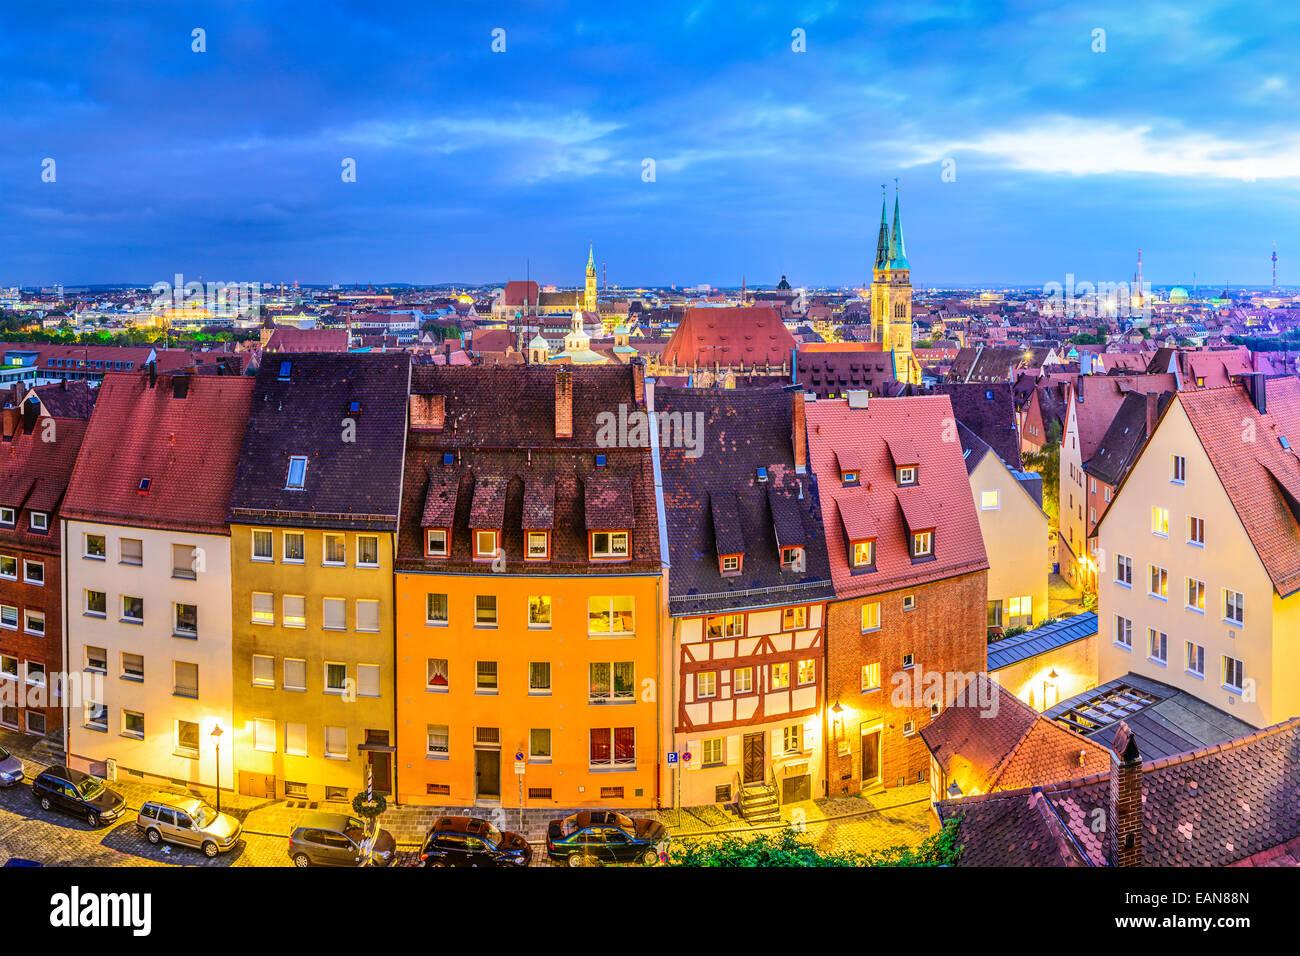 Nuremberg, Germany old city skyline. - Stock Image